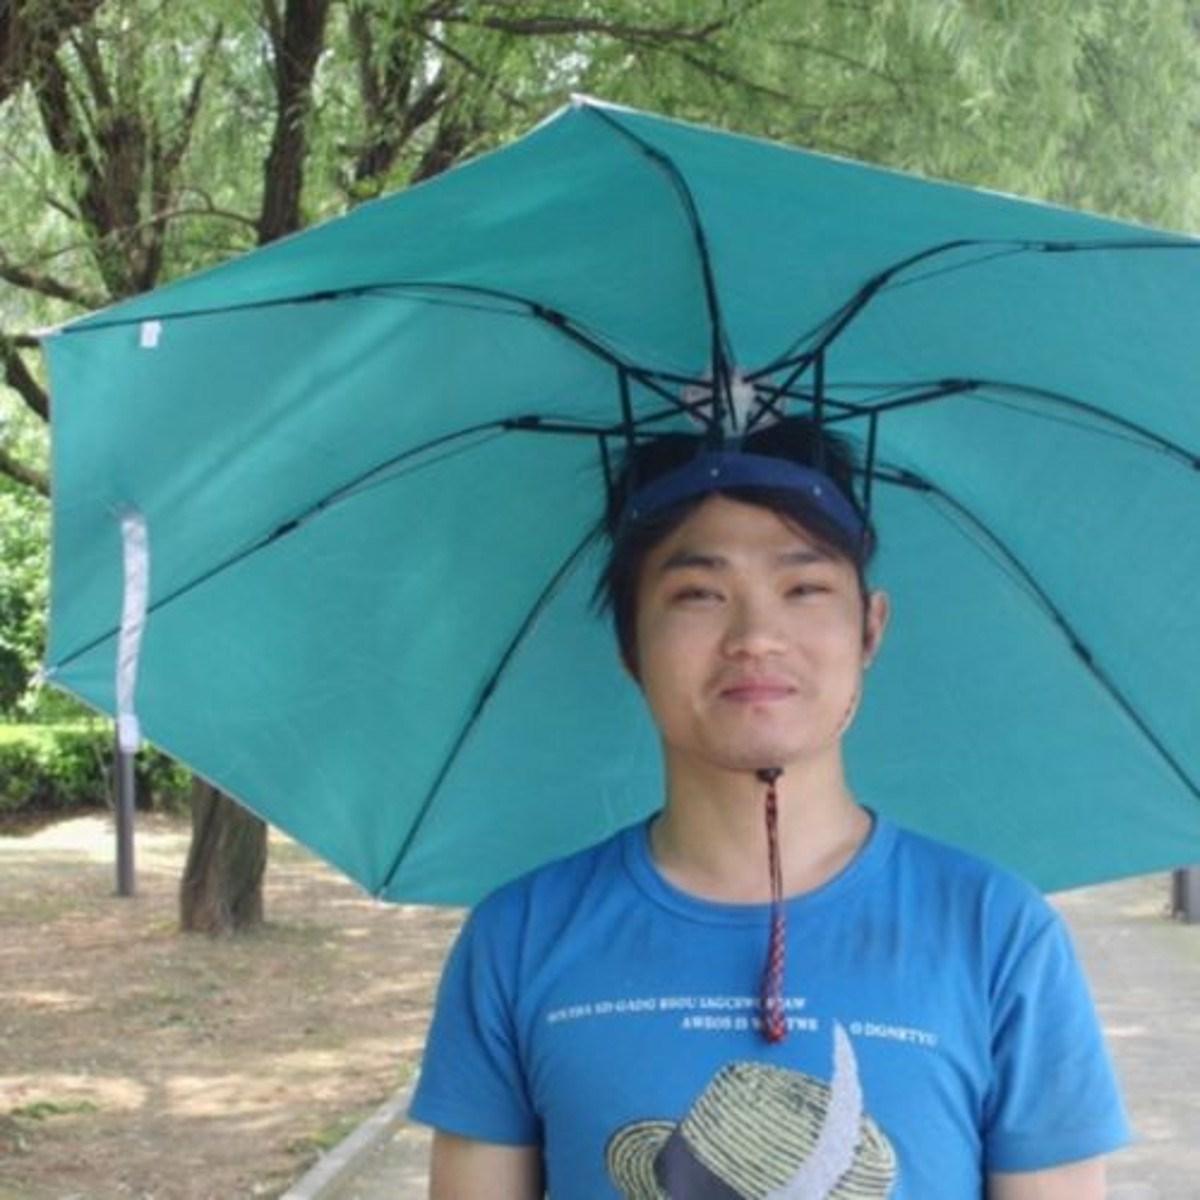 ce4b88dfa3523 Unisex Umbrella Hat Fishing Hunting Large Umbrella Sun Protection Paras UV  Proof Bumber Paraguas Outdoors Rain Gear